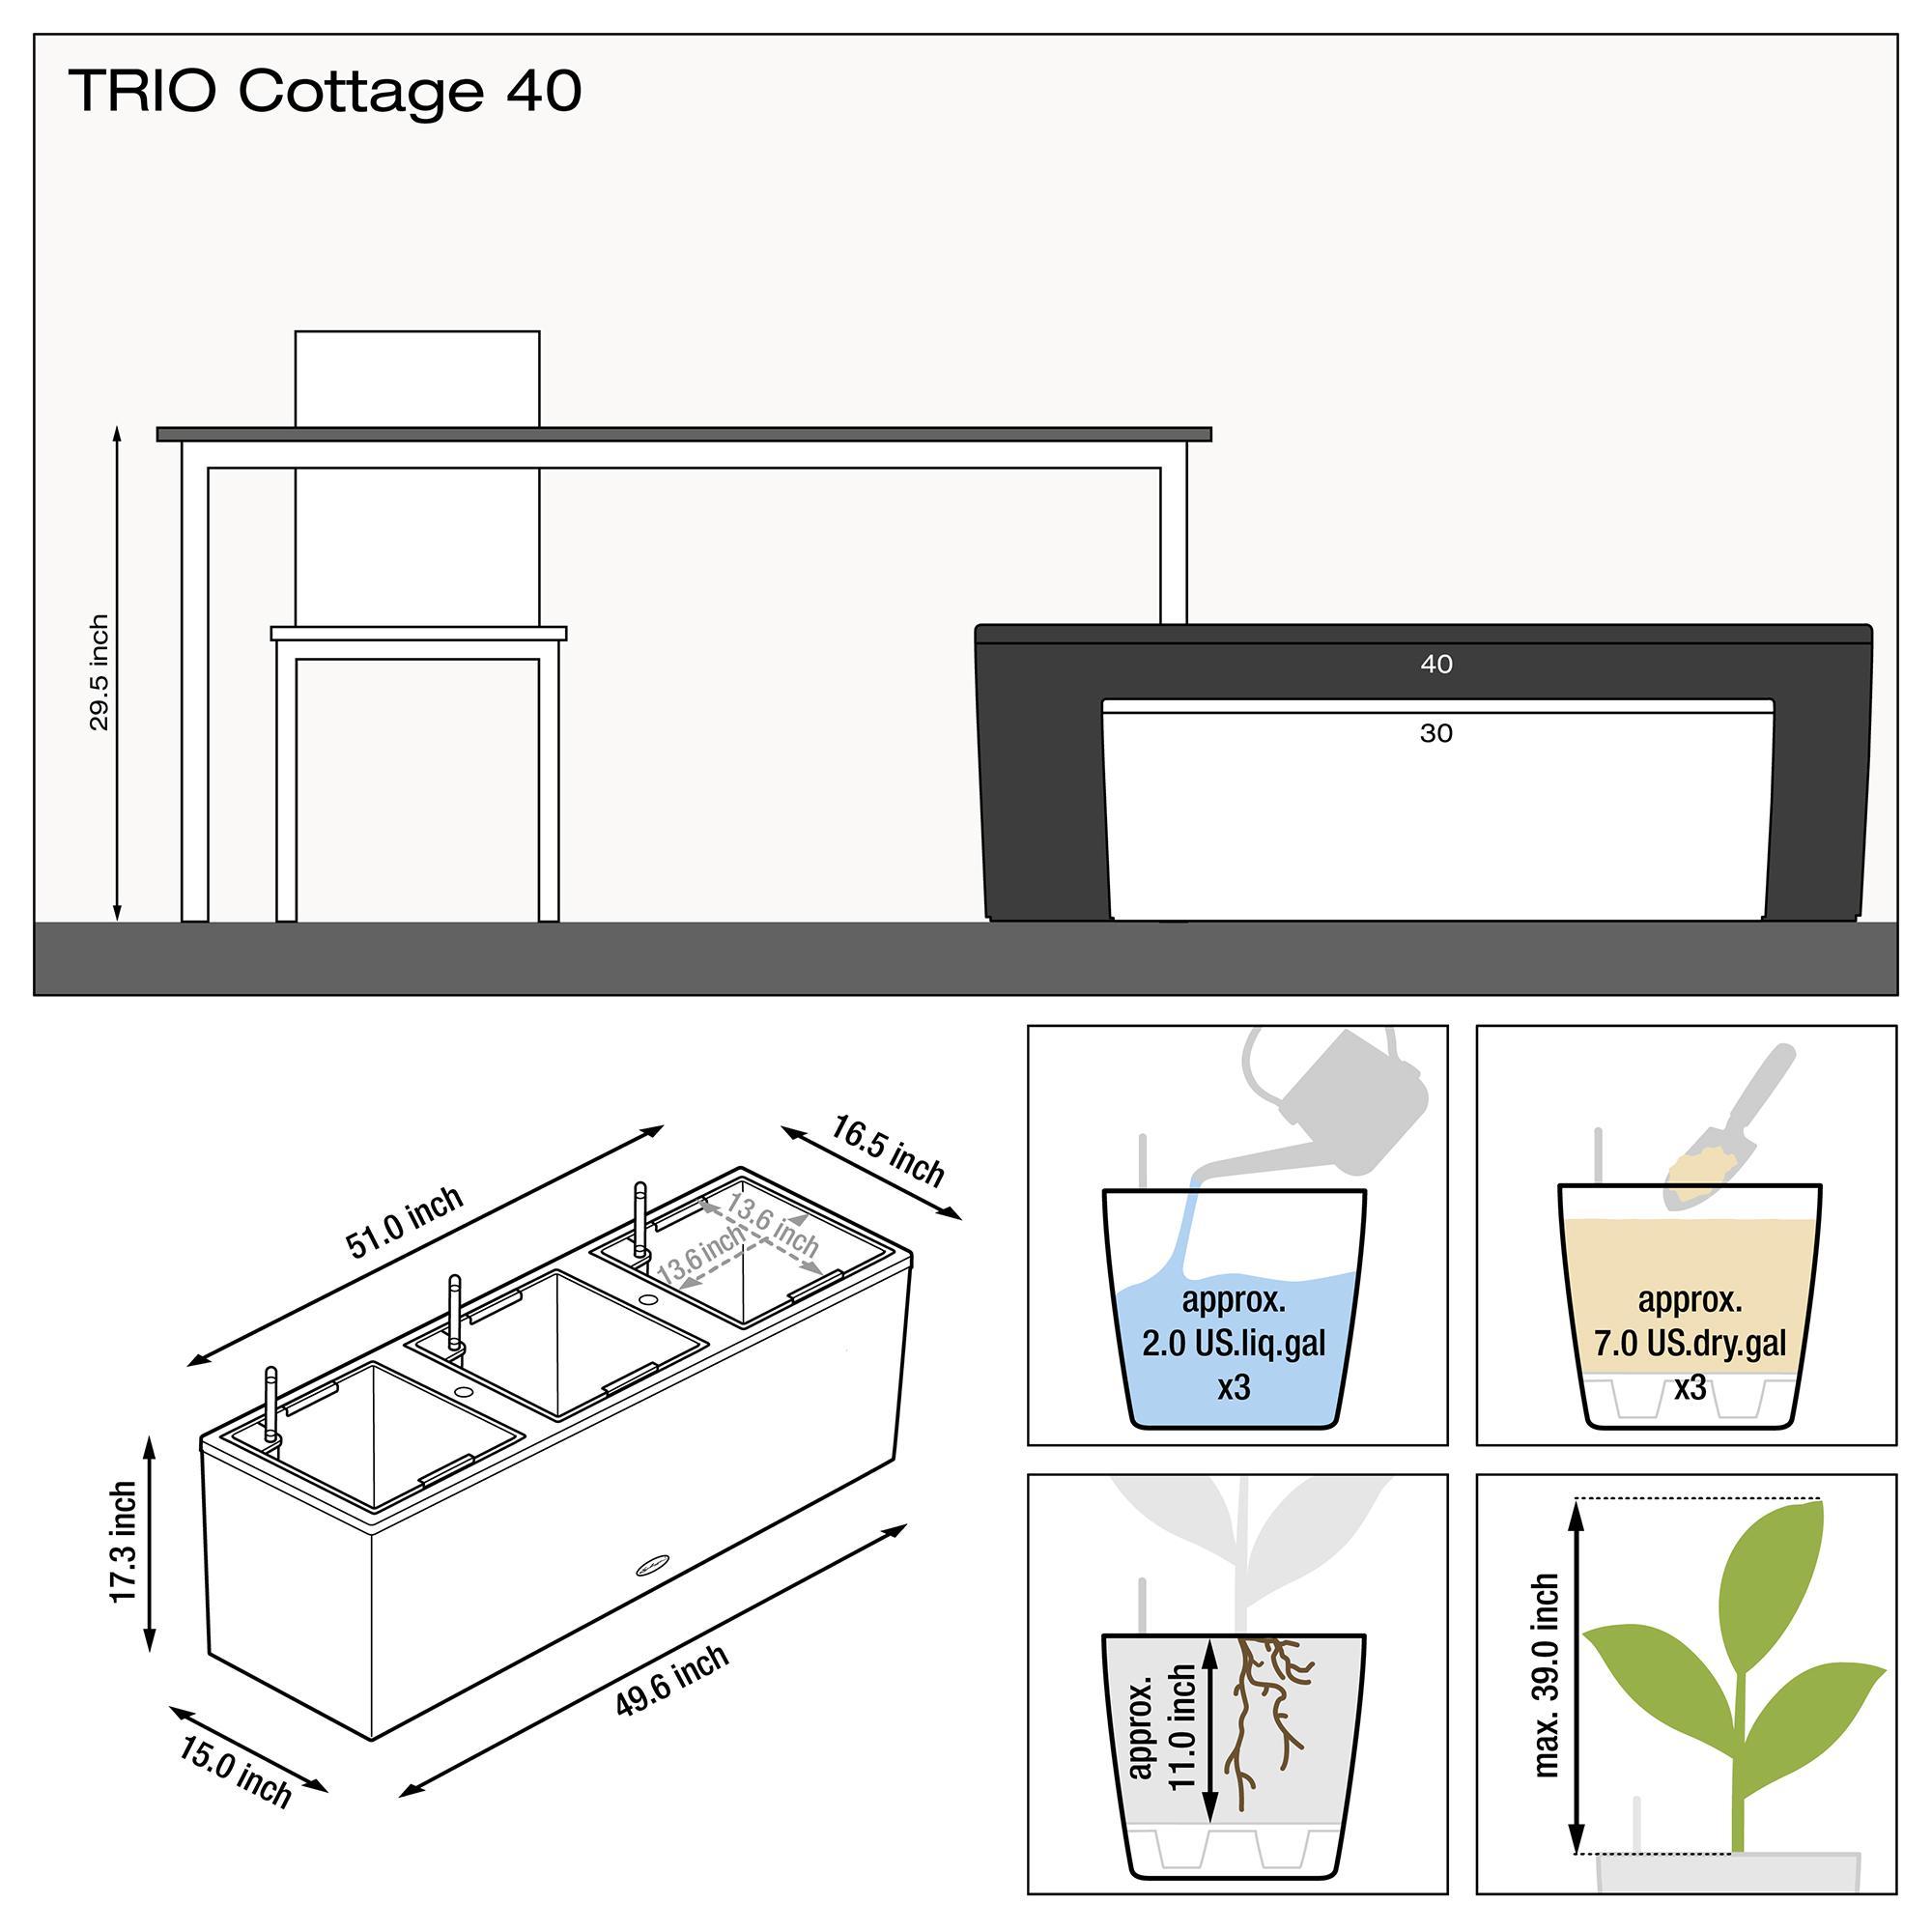 le_trio-cottage40_product_addi_nz_us